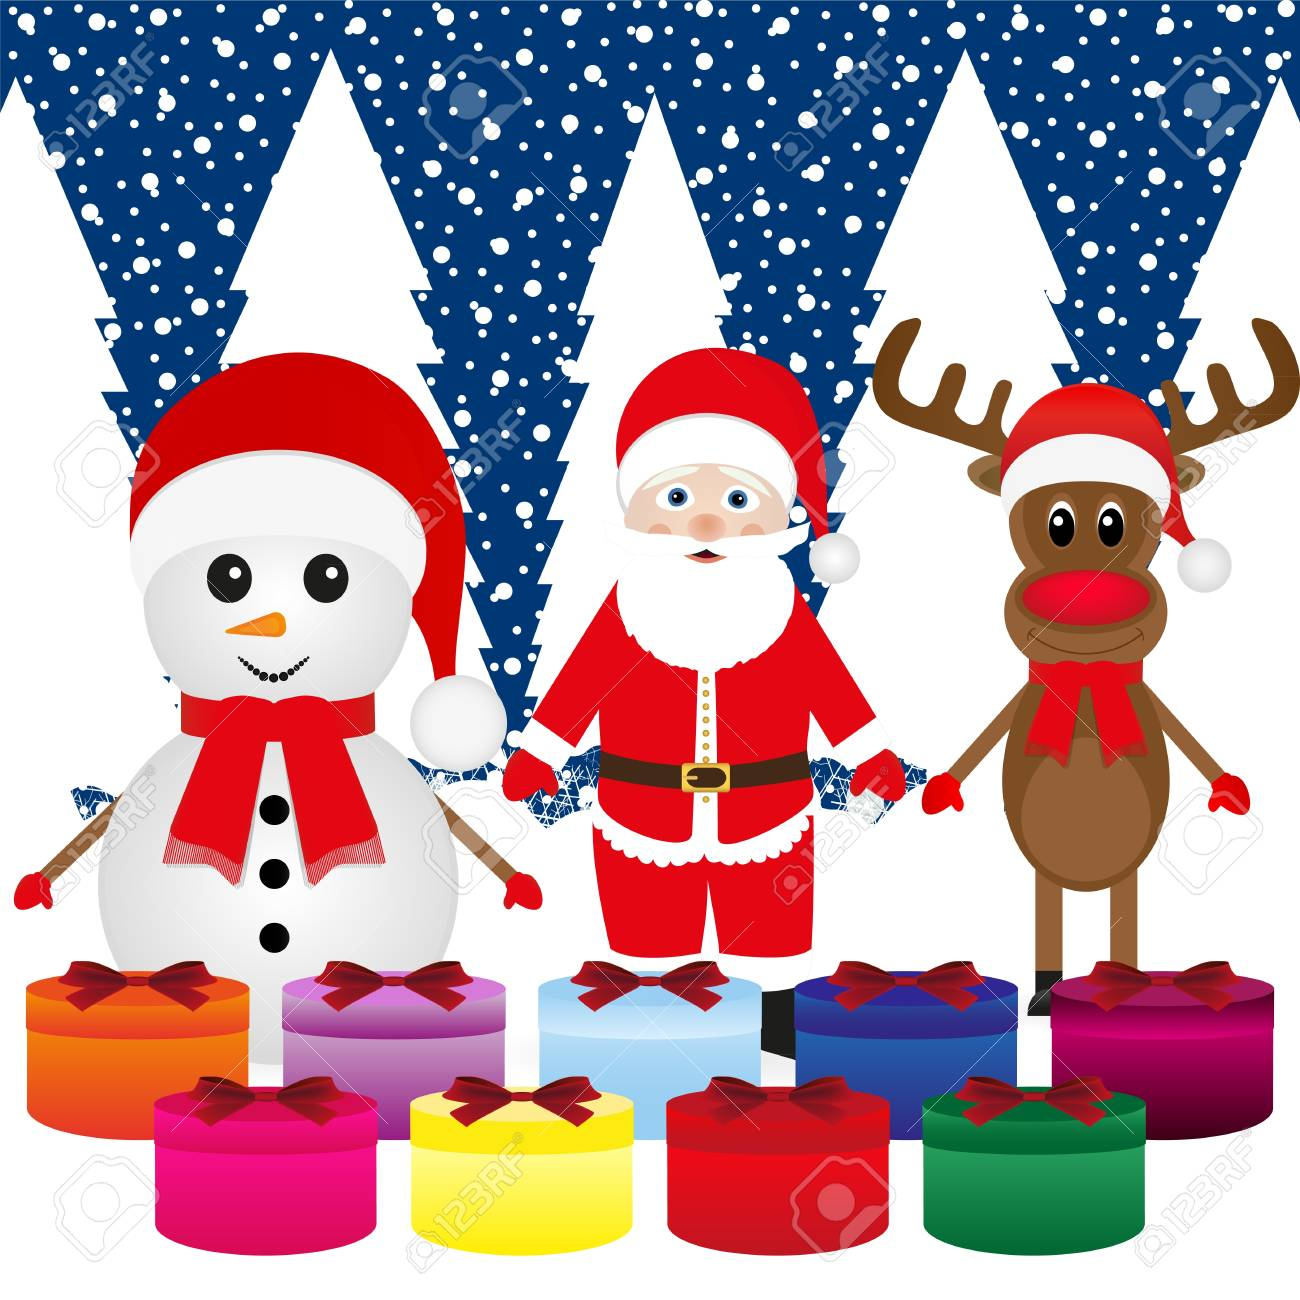 Snowman, Santa Claus, reindeer and present Stock Vector - 16973718